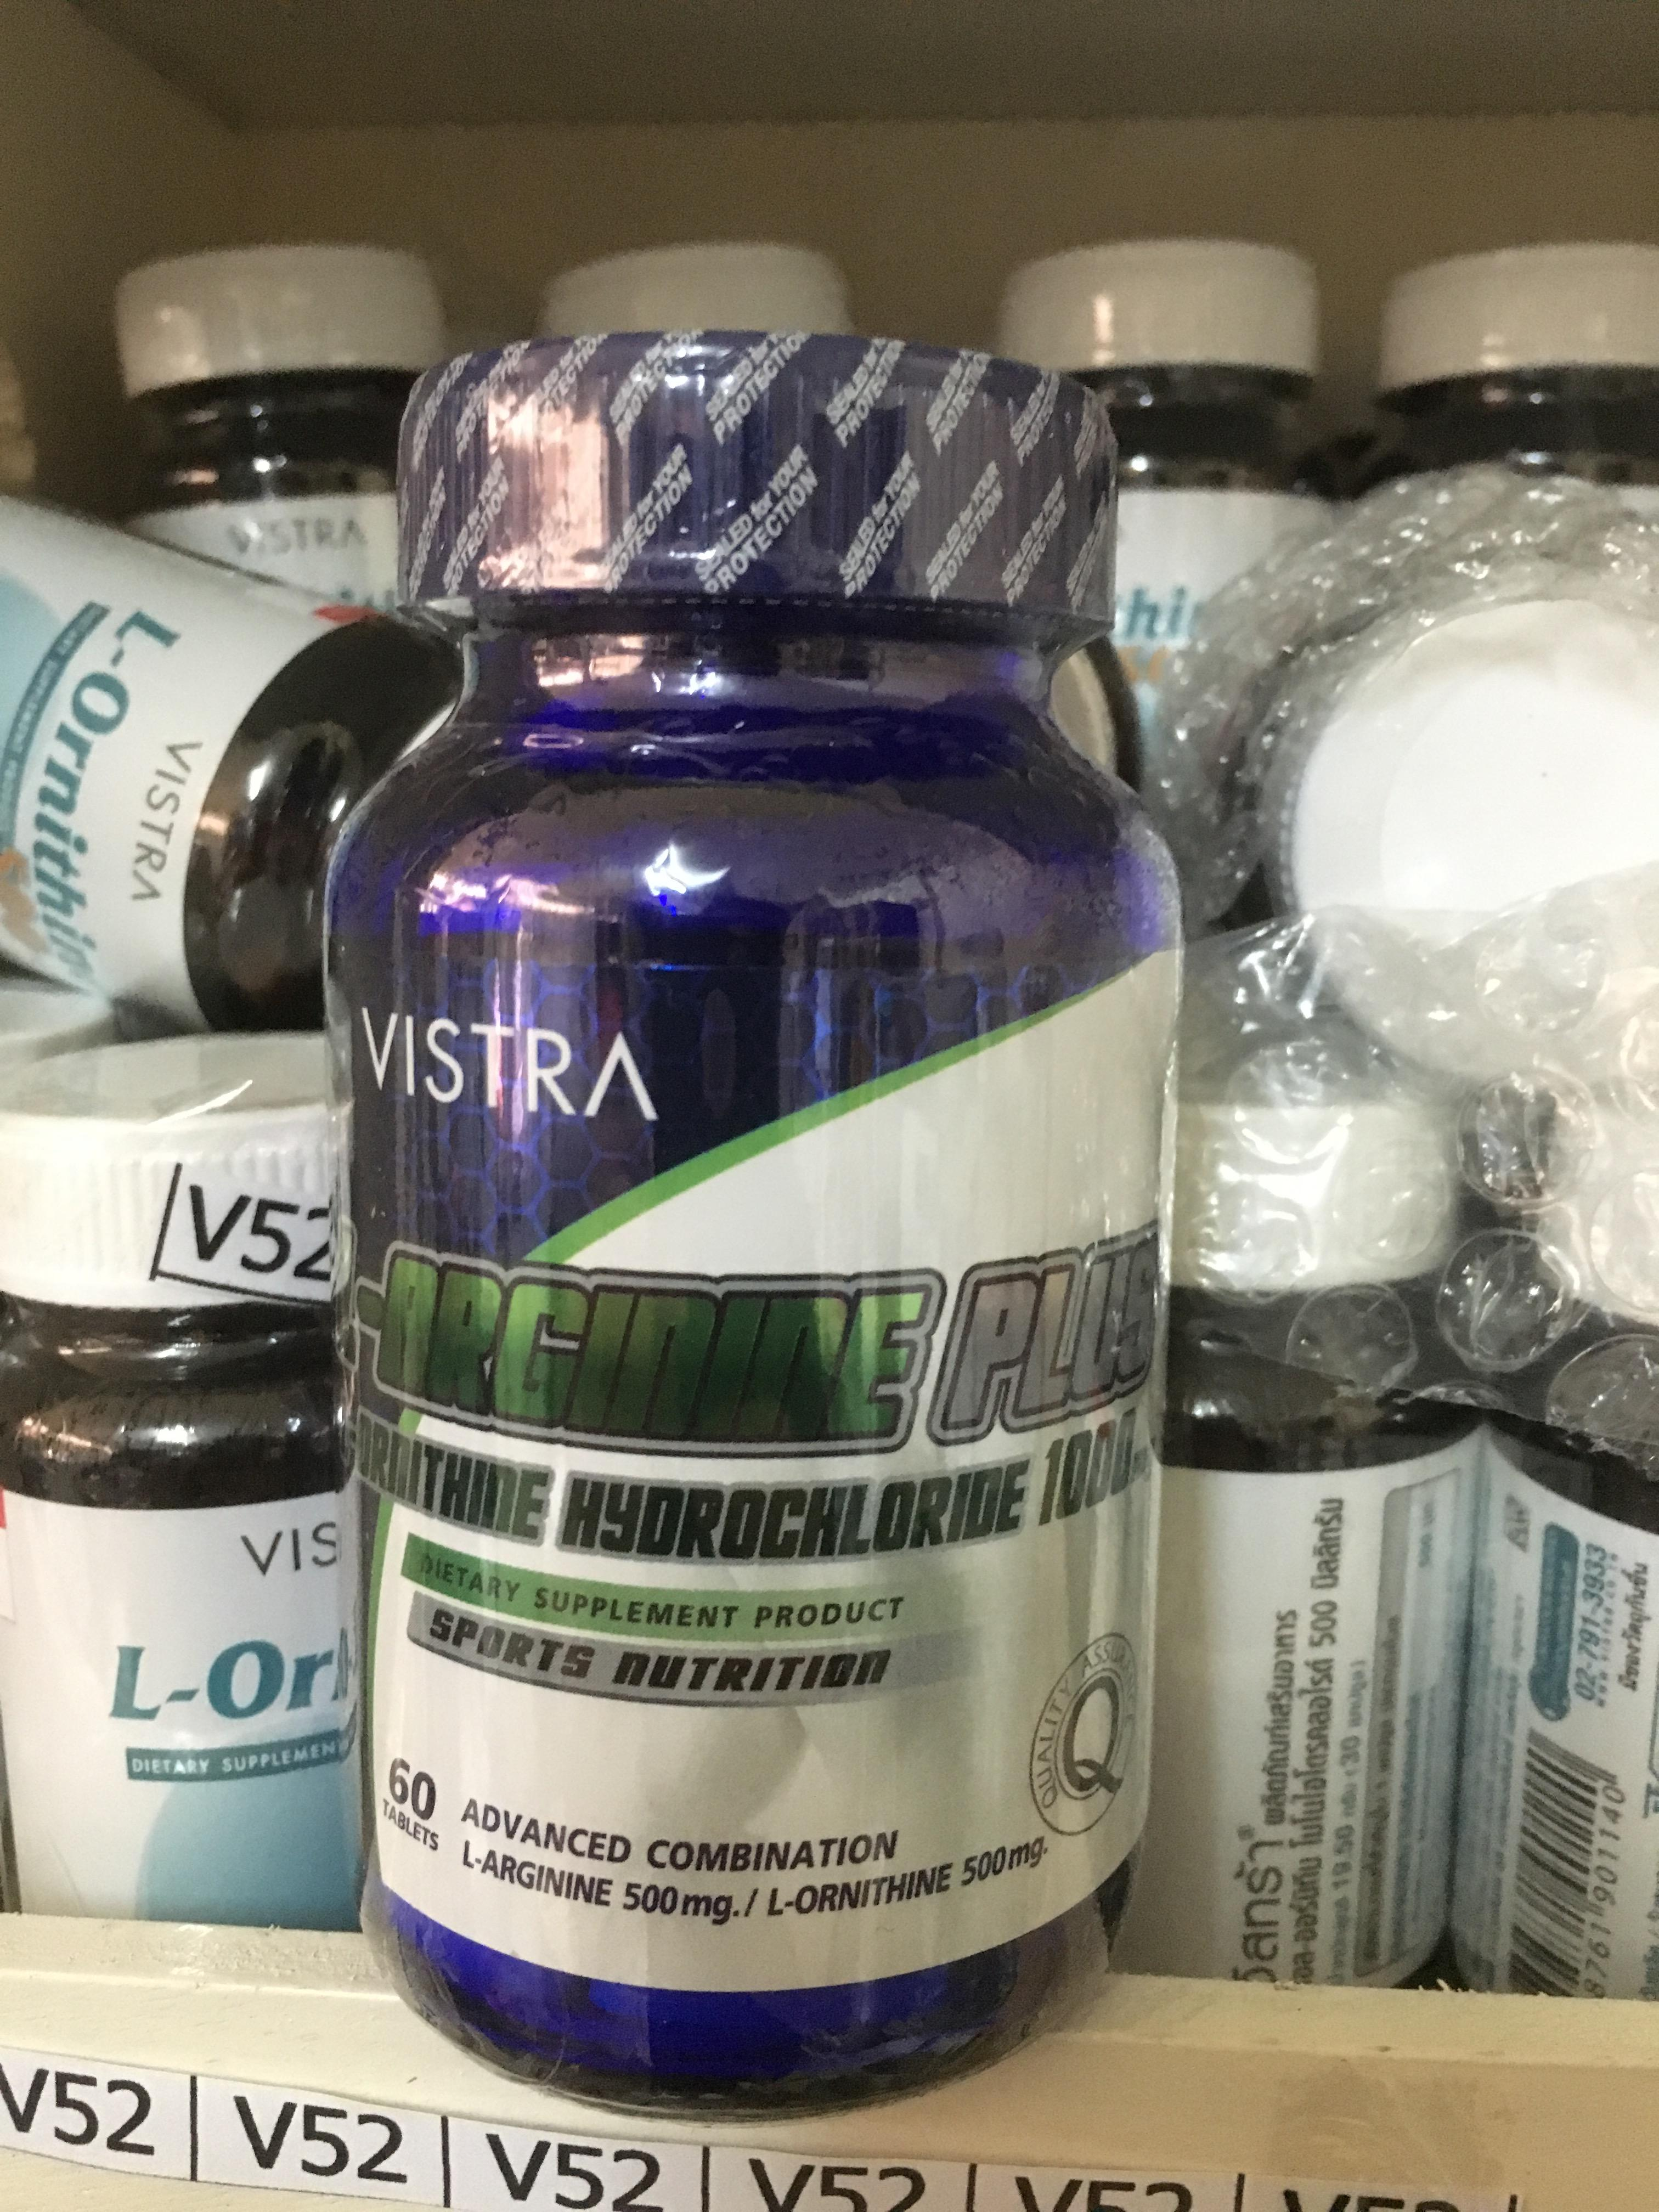 VISTRA L-ARGININE and L-Ornithine 500 mg 60 เม็ด คุ้มค่าคุ้มราคา